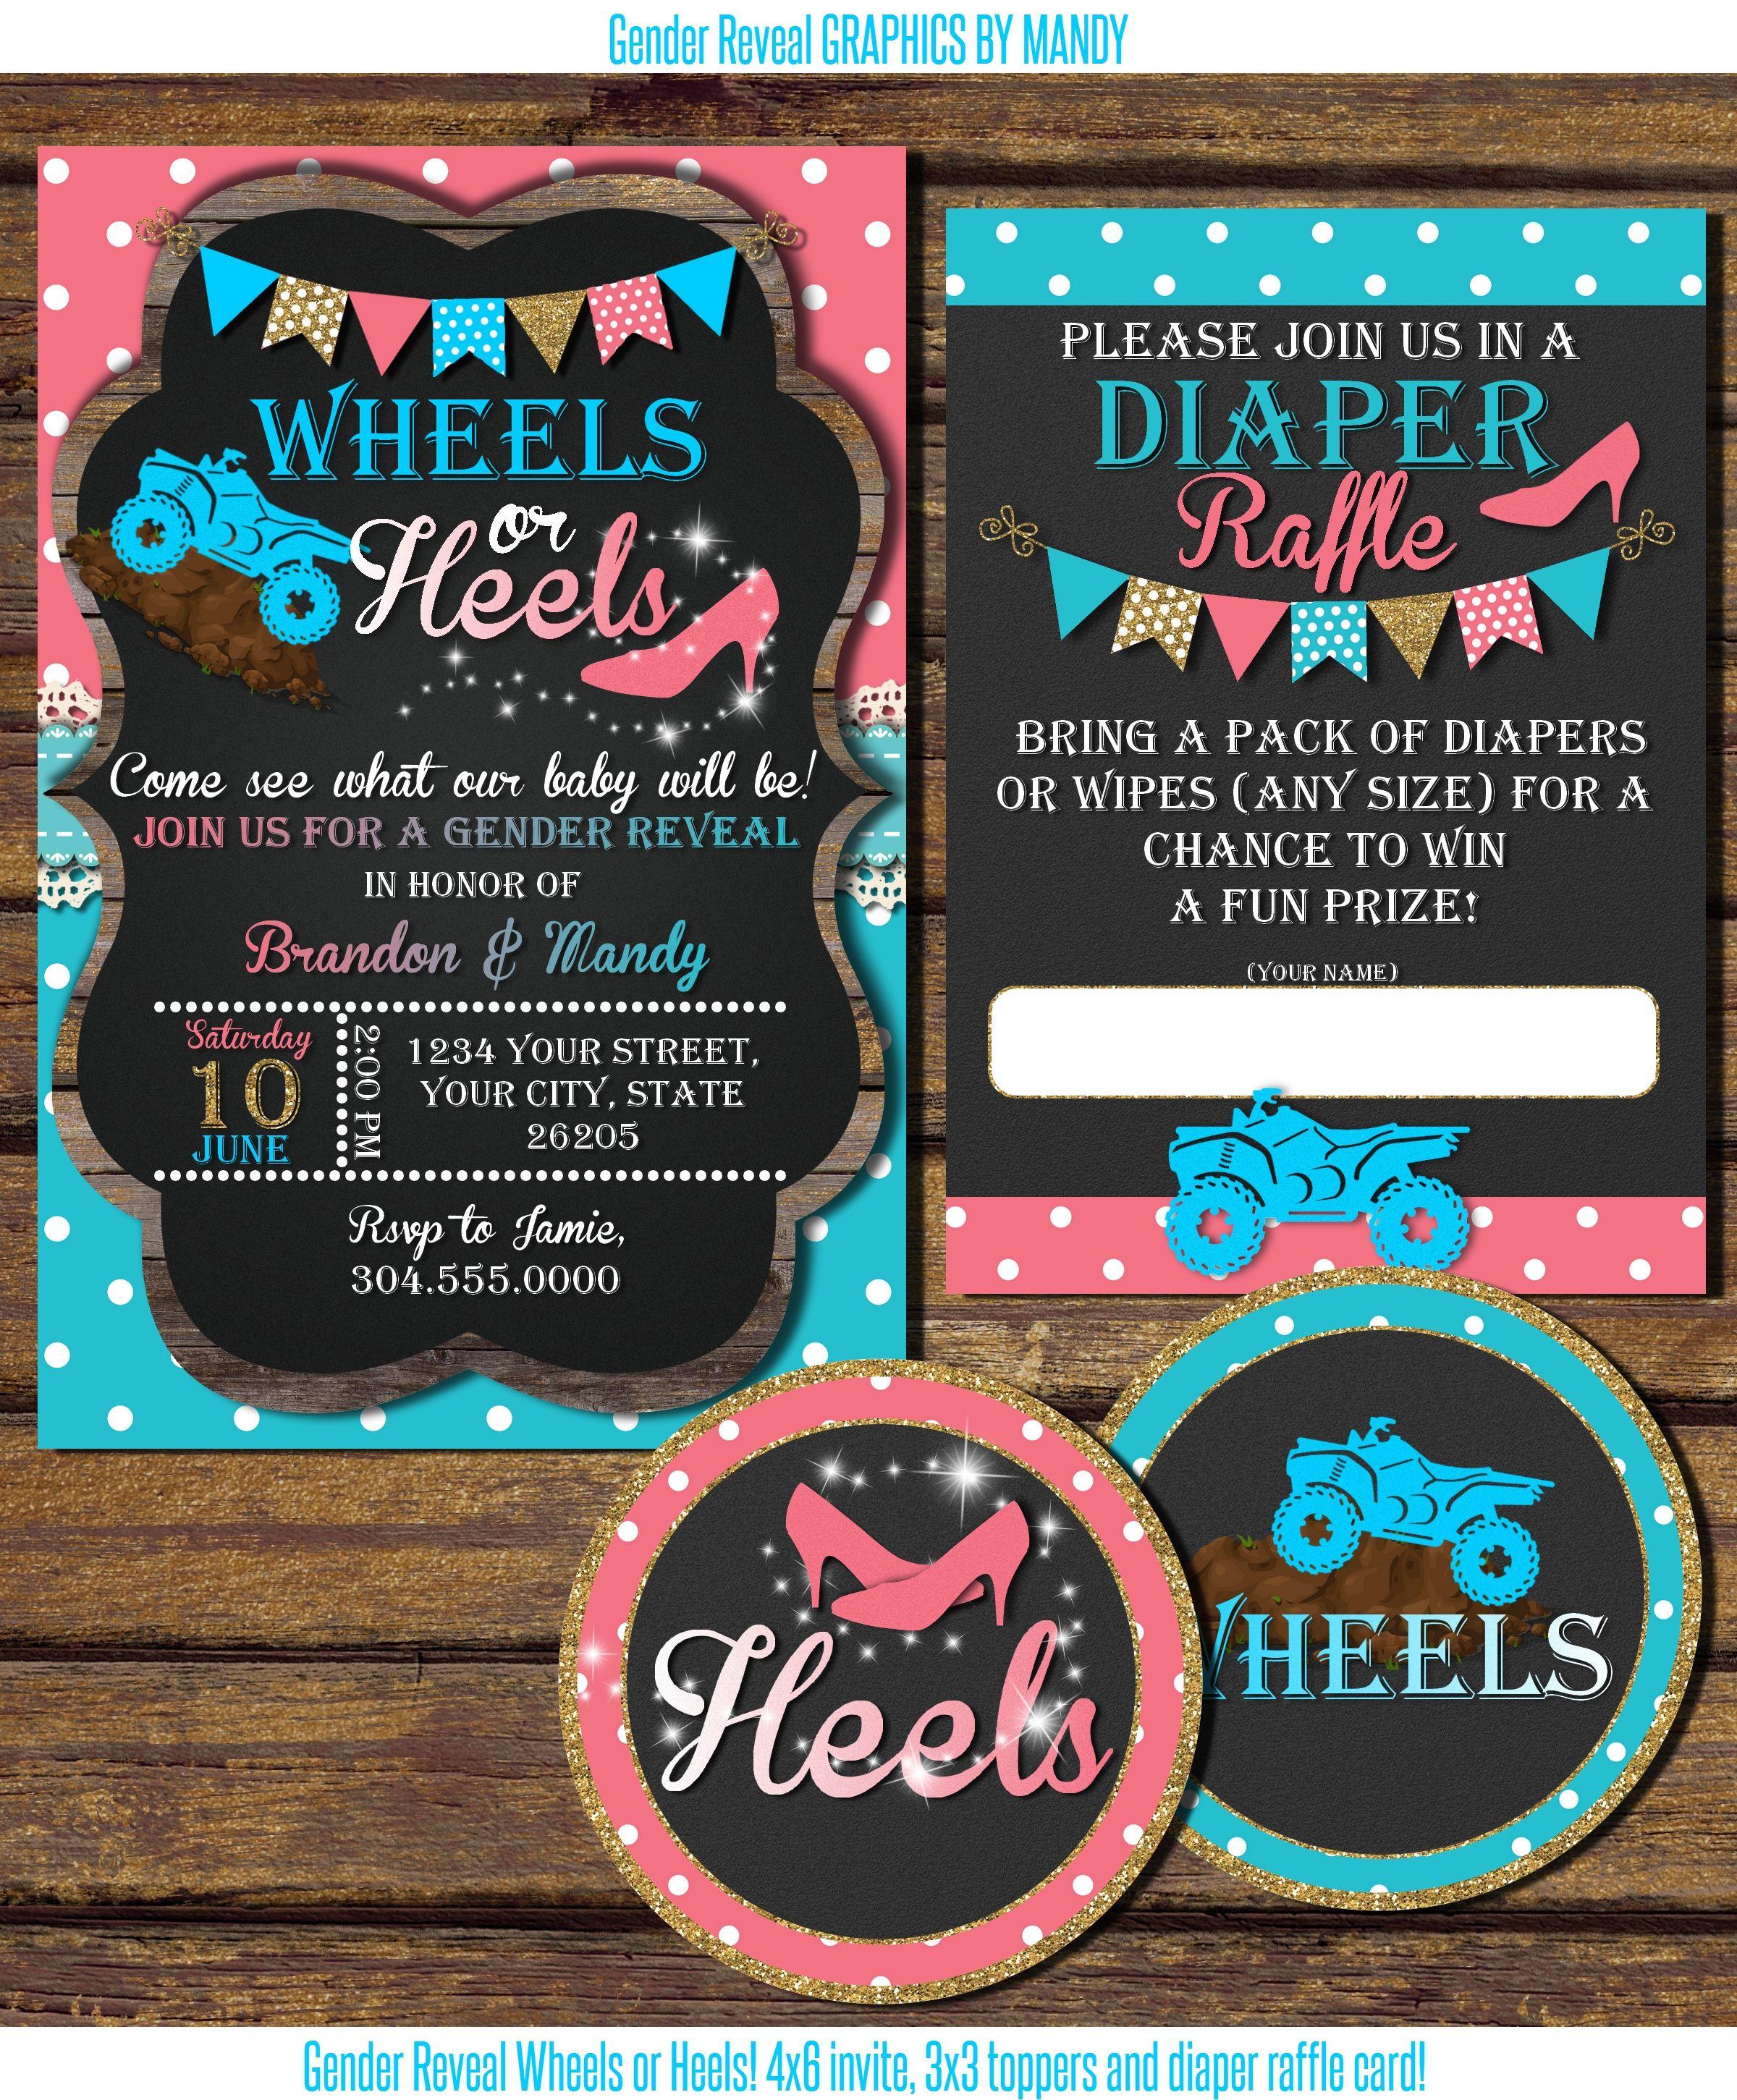 Wheels Or Heels Gender Reveal Invitation And Diaper Raffle Baby Gender Reveal Party Gender Reveal Invitations Gender Reveal Themes